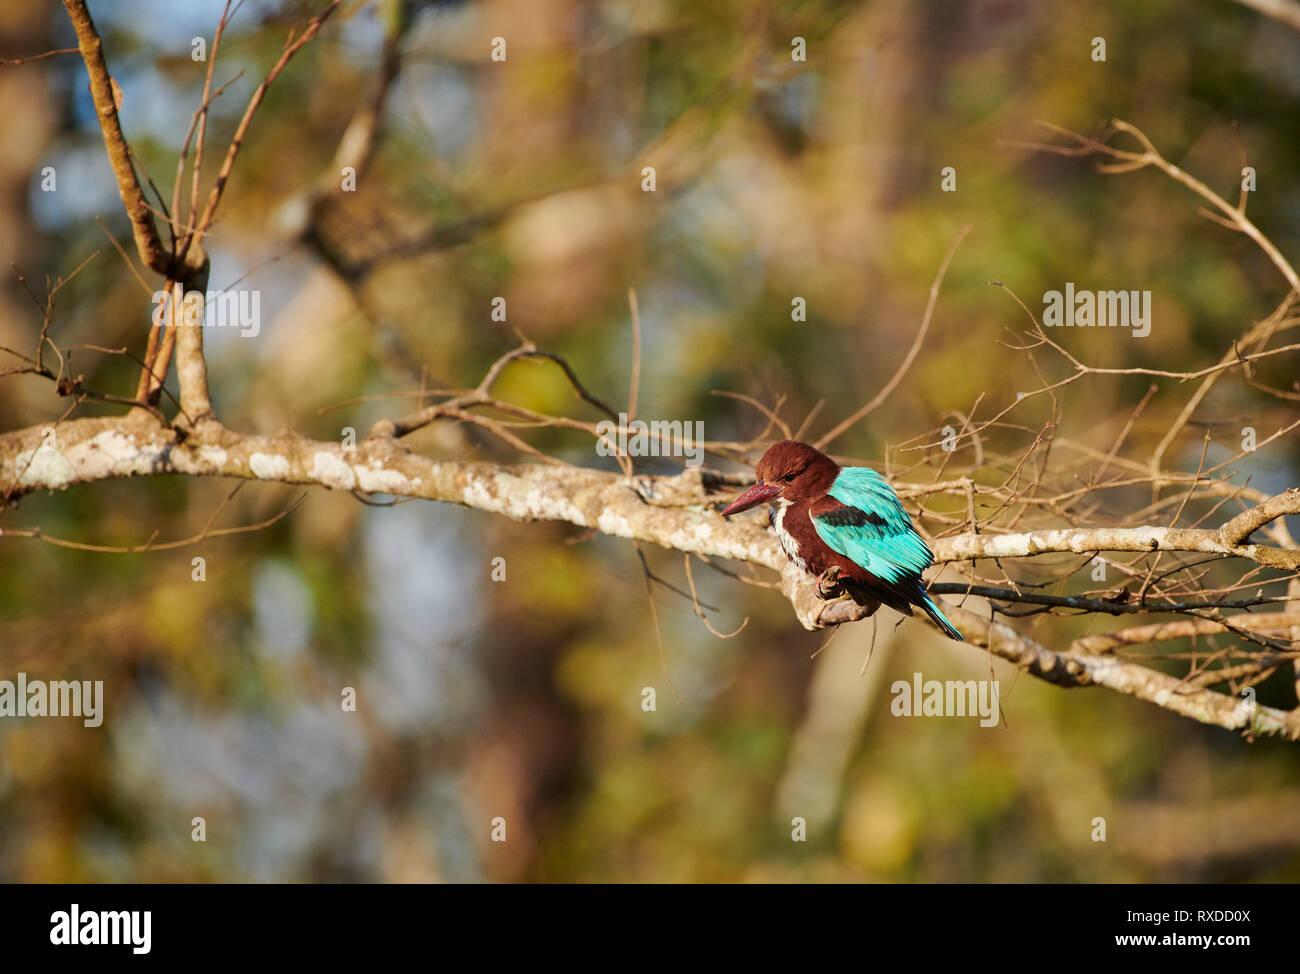 White-throated Kingfisher, Halcyon smyrnensis, Kabini, Nagarhole Tiger Reserve, Karnataka, India - Stock Image